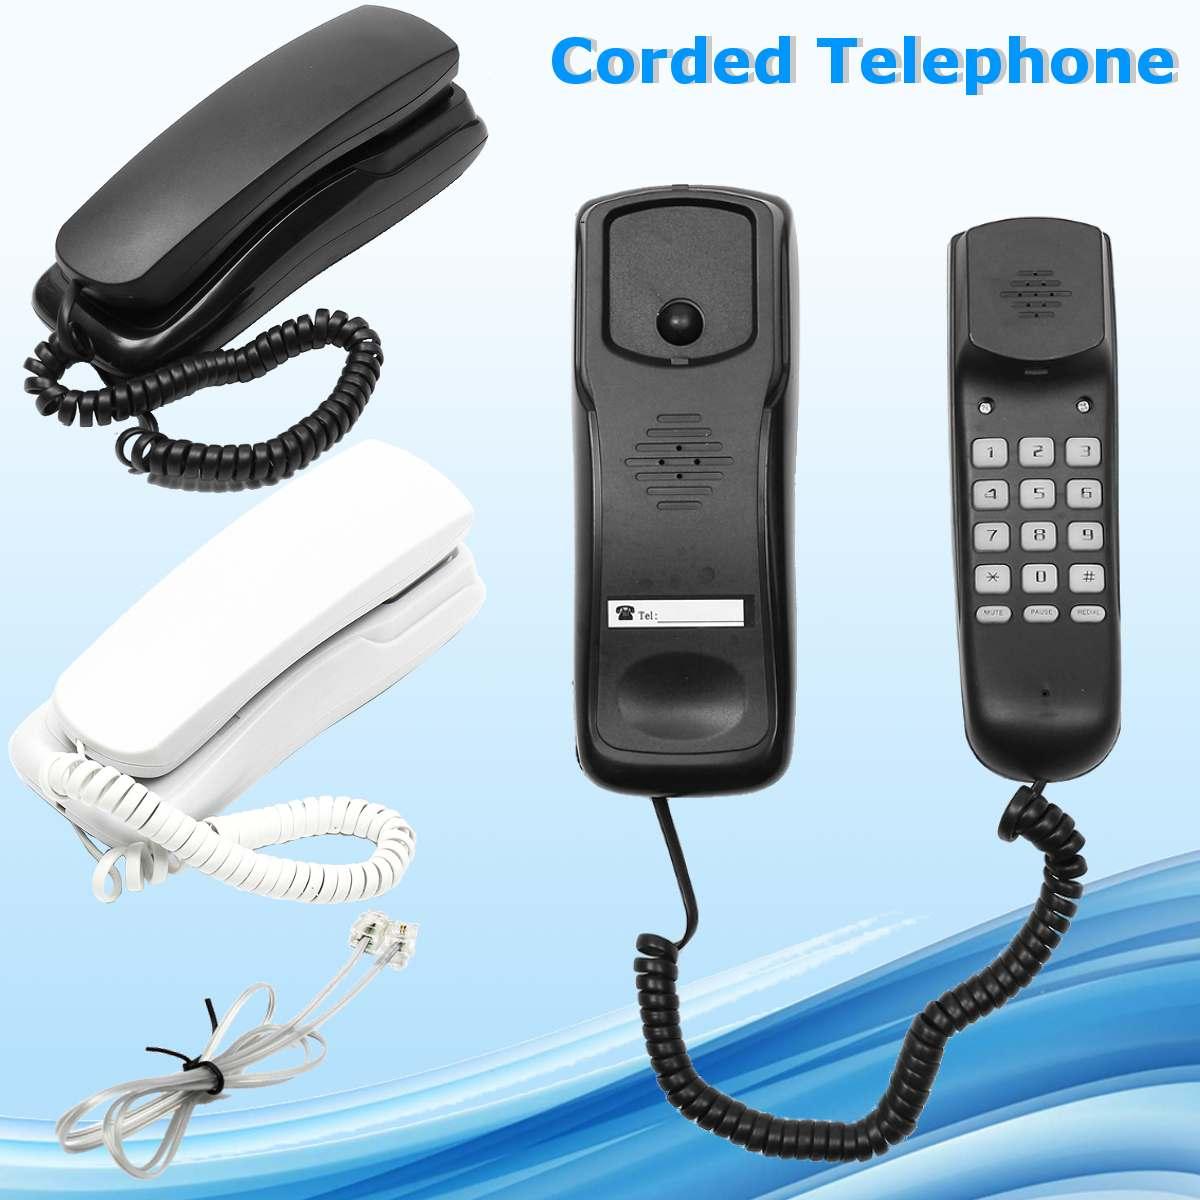 DC 48V Wall Telephone Corded Telephone Home Office Hotel Desktop Volume Control  Landline Phone White/Black